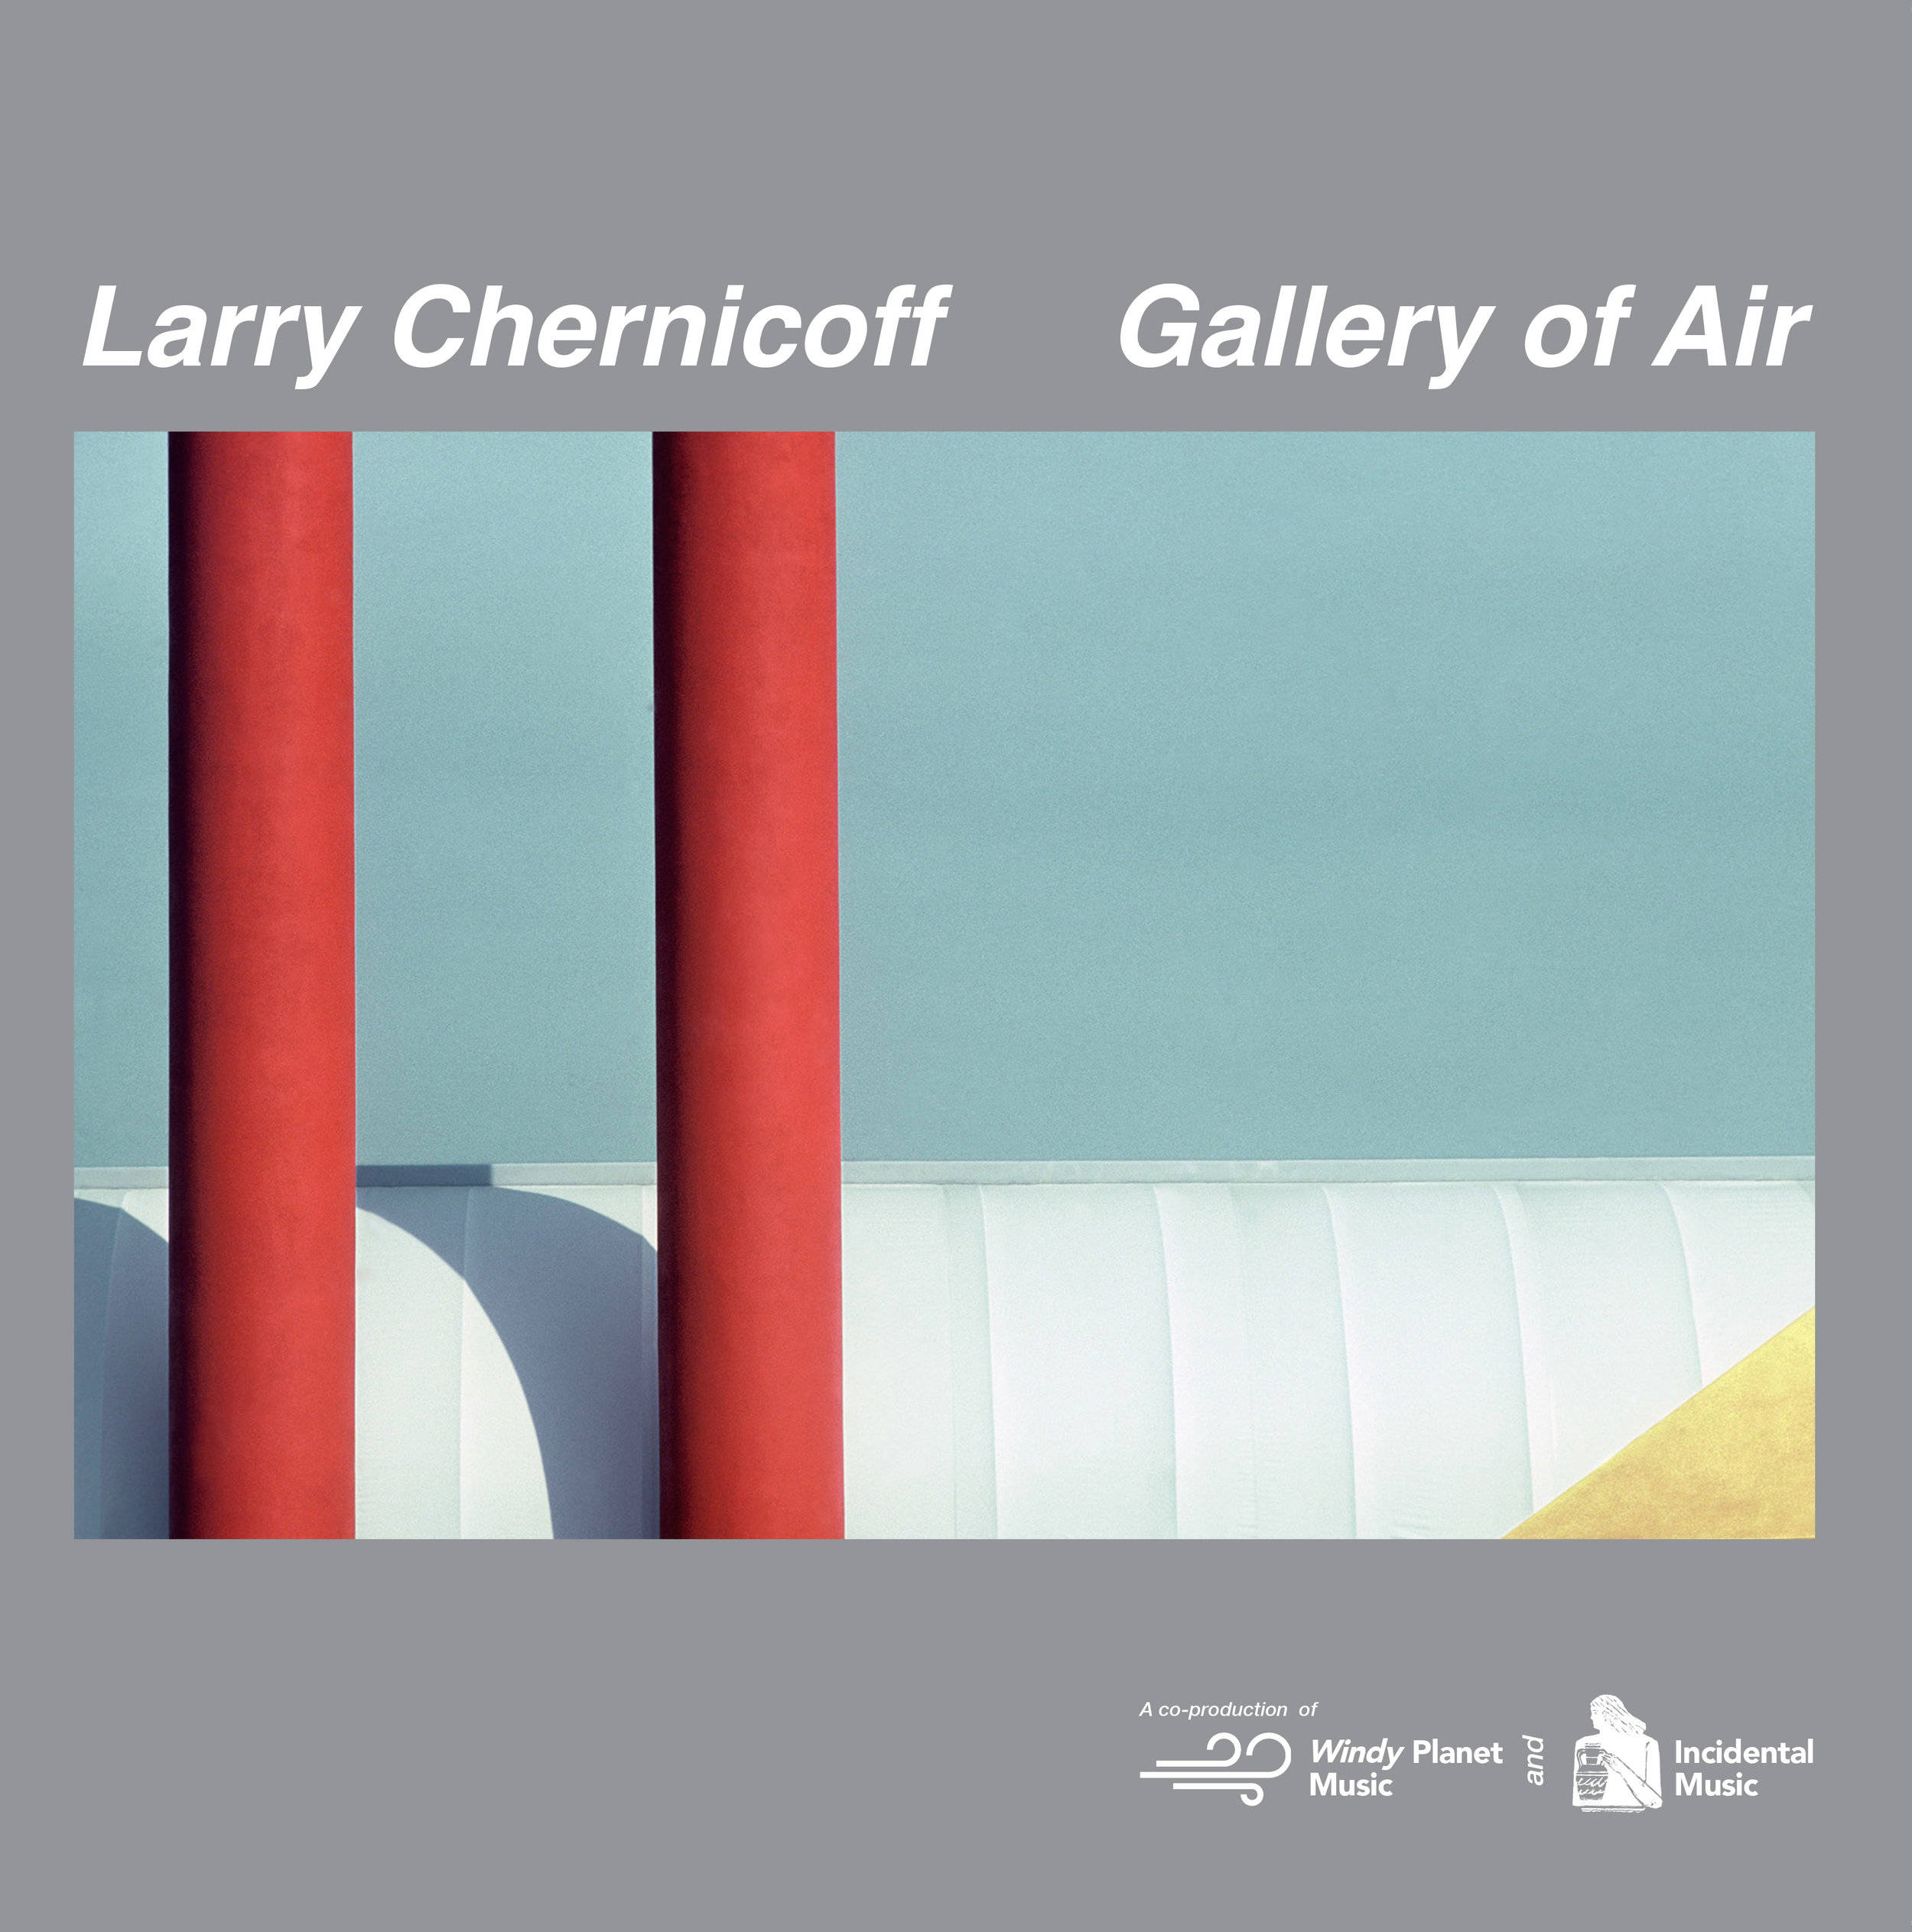 I.M.Larry.Chernicoff.Gallery.of.Air